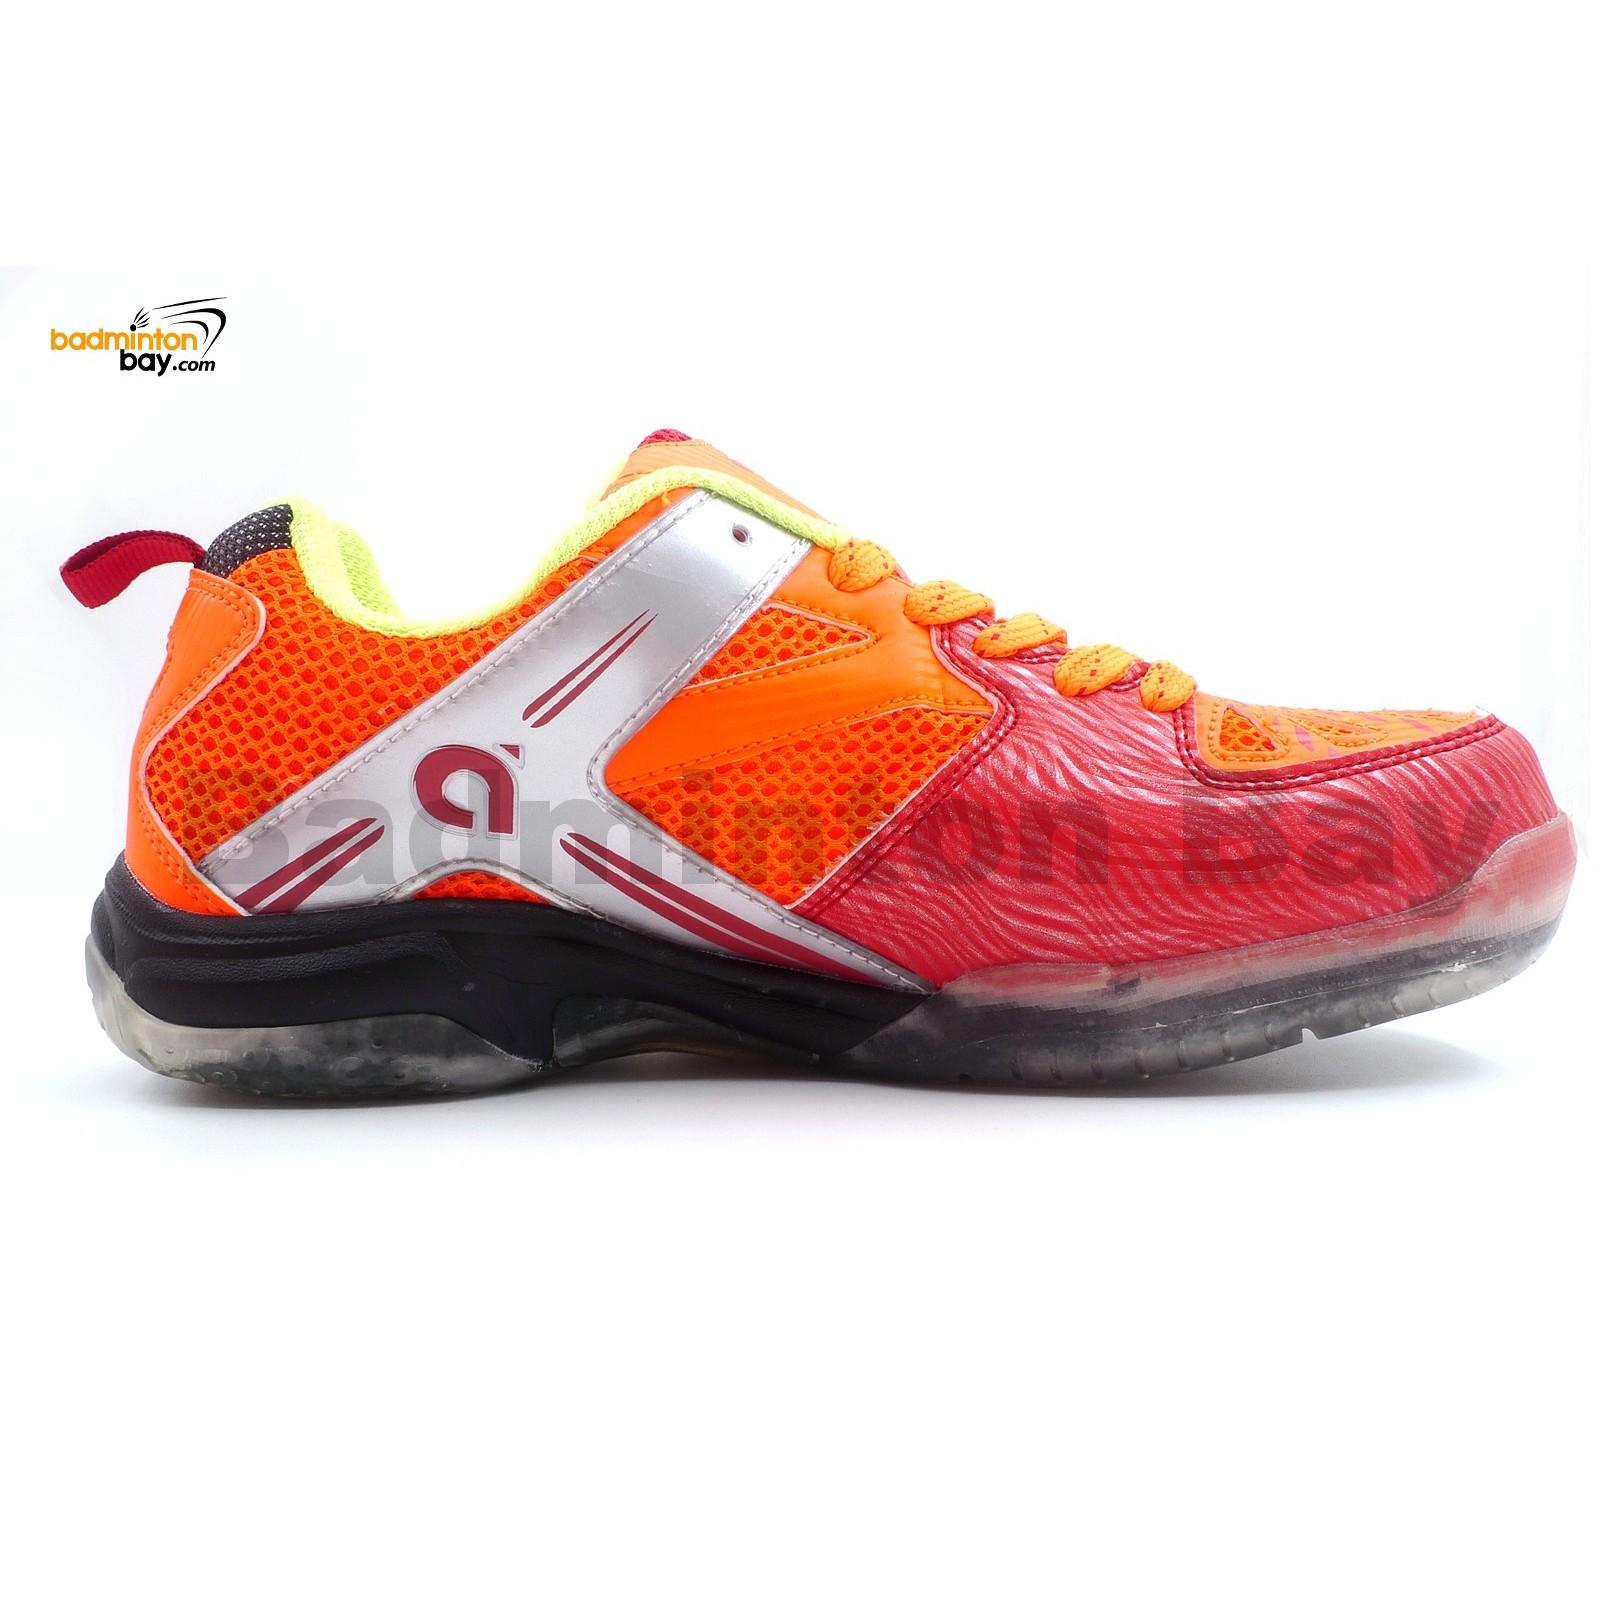 Men Footwear Sandals Images Sale Types Of Clothing